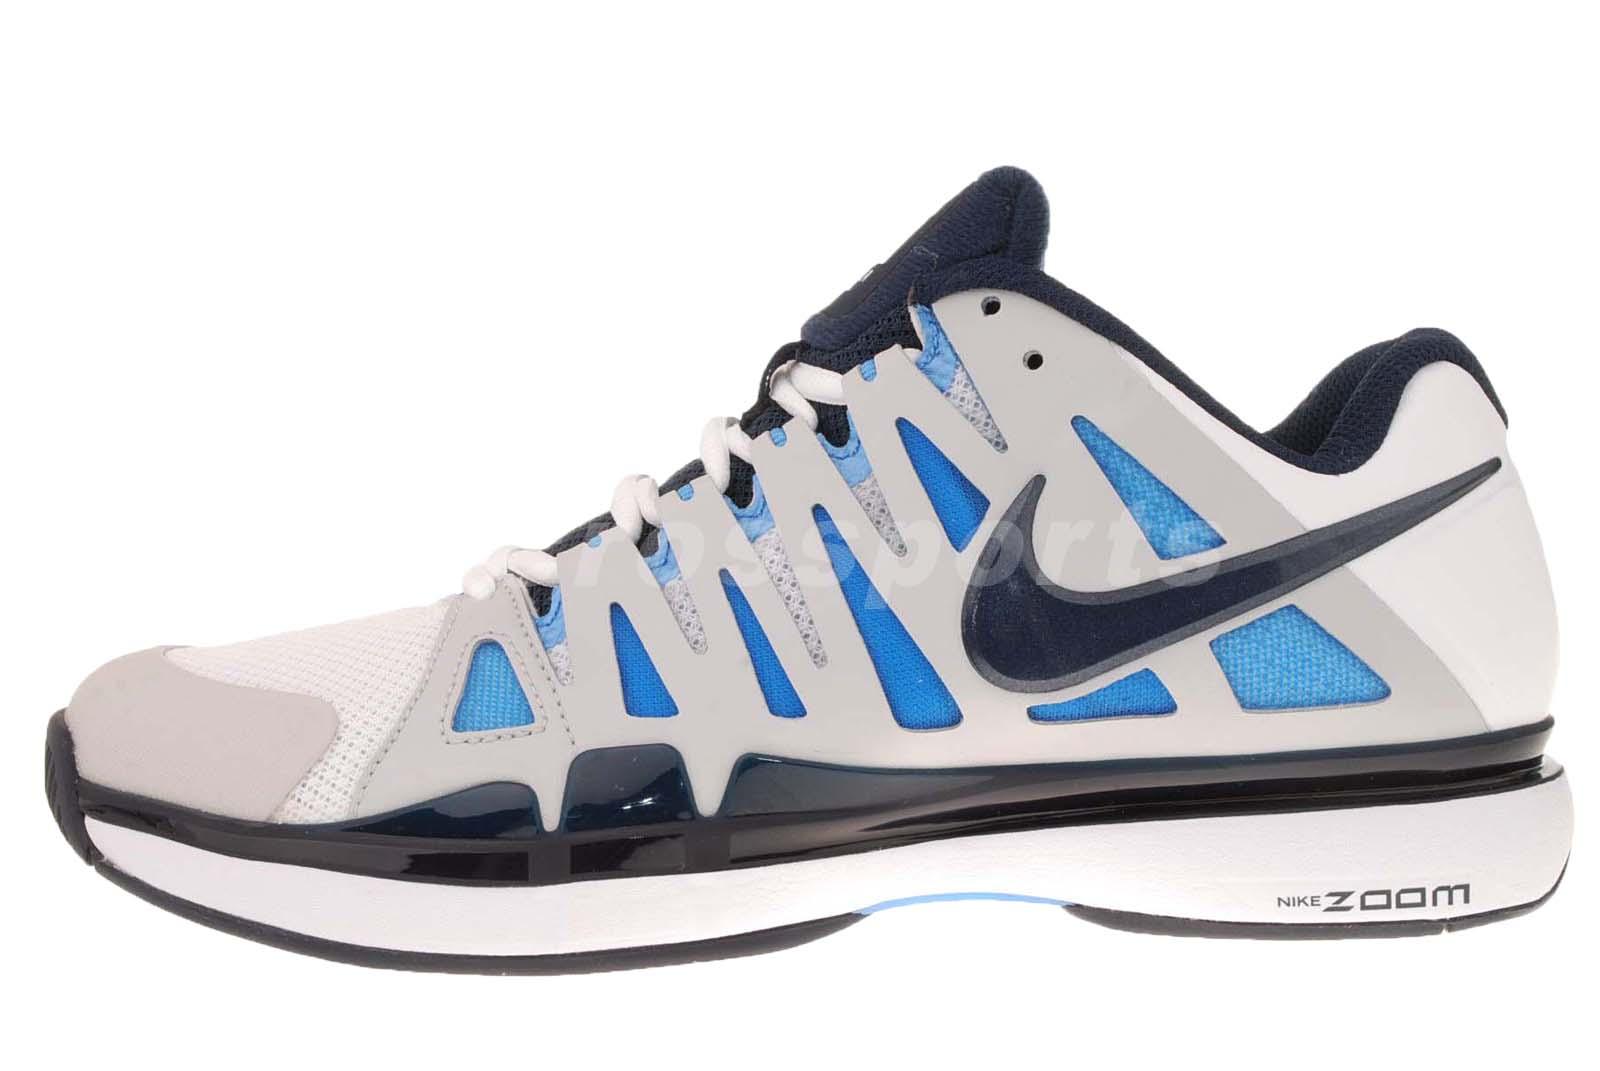 nike zoom vapor 9 tour roger federer tennis shoes trainer